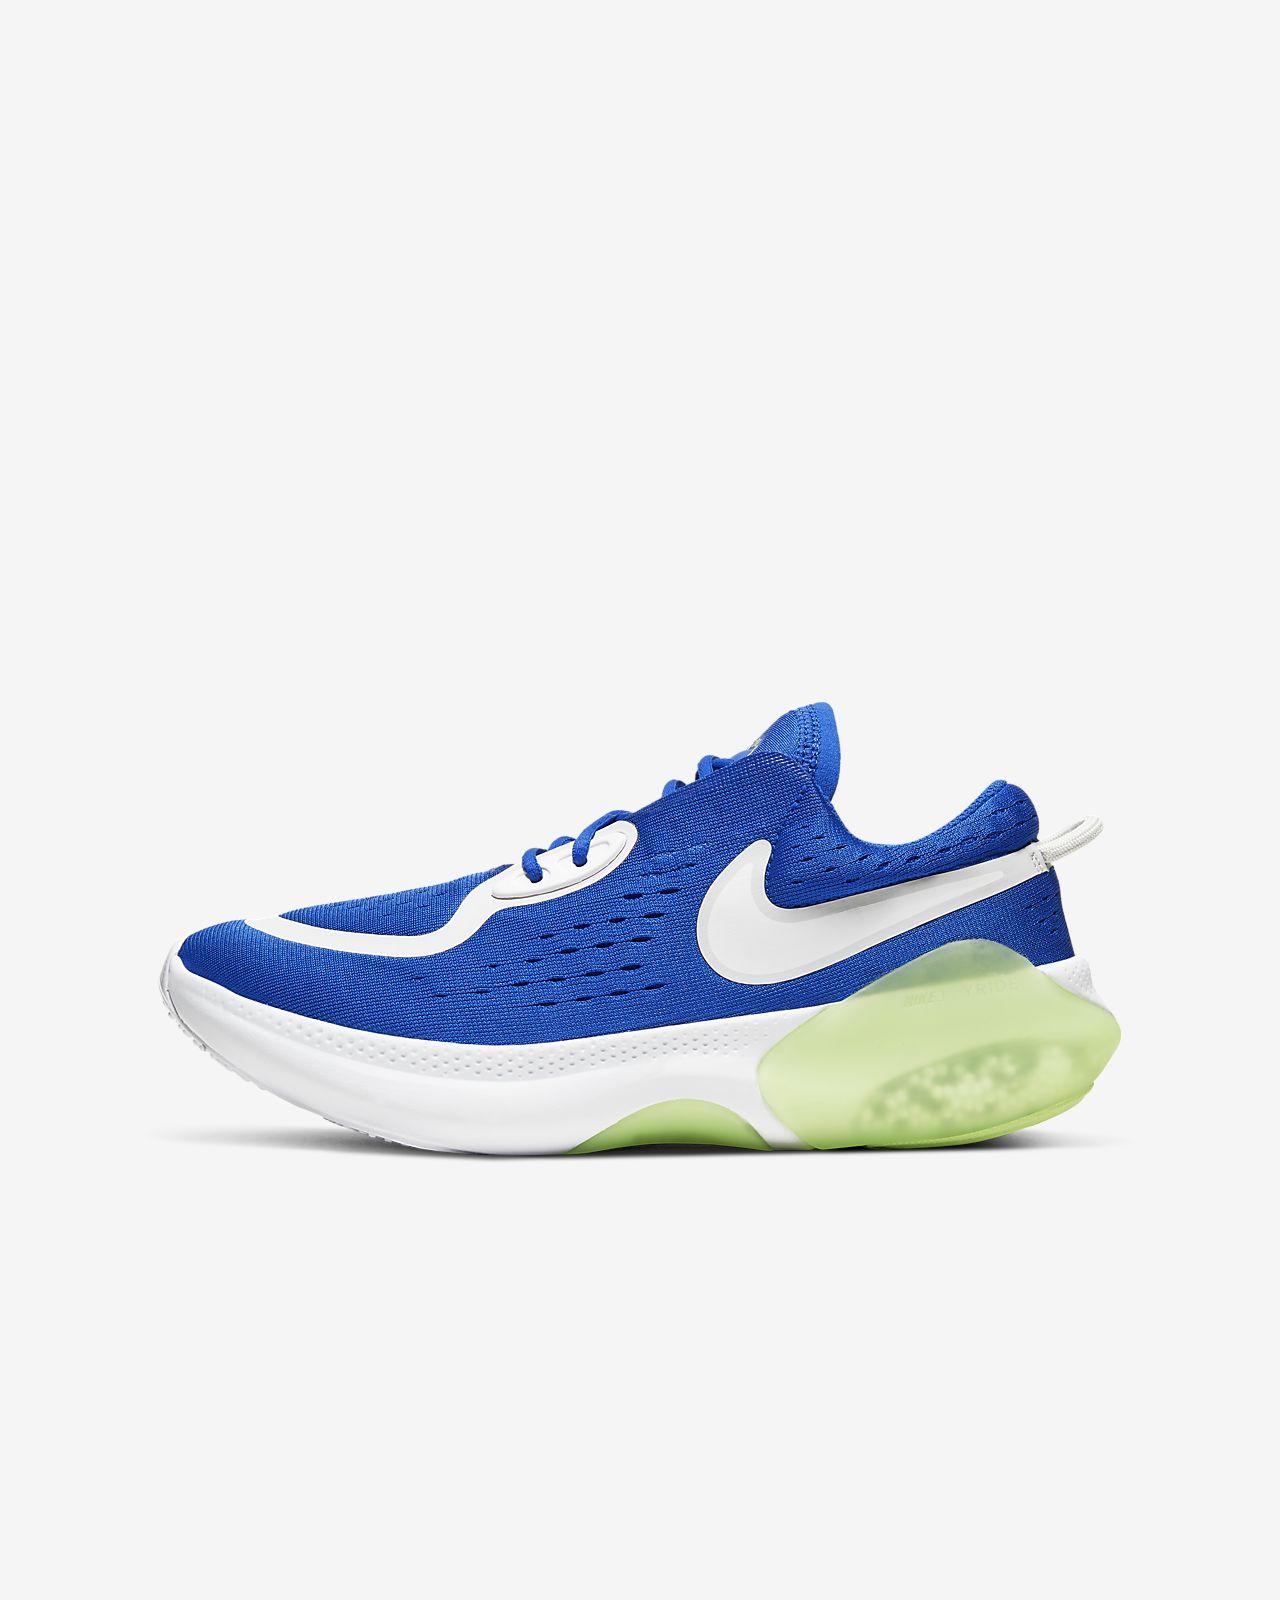 Calzado de running para niños talla grande Nike Joyride Dual Run